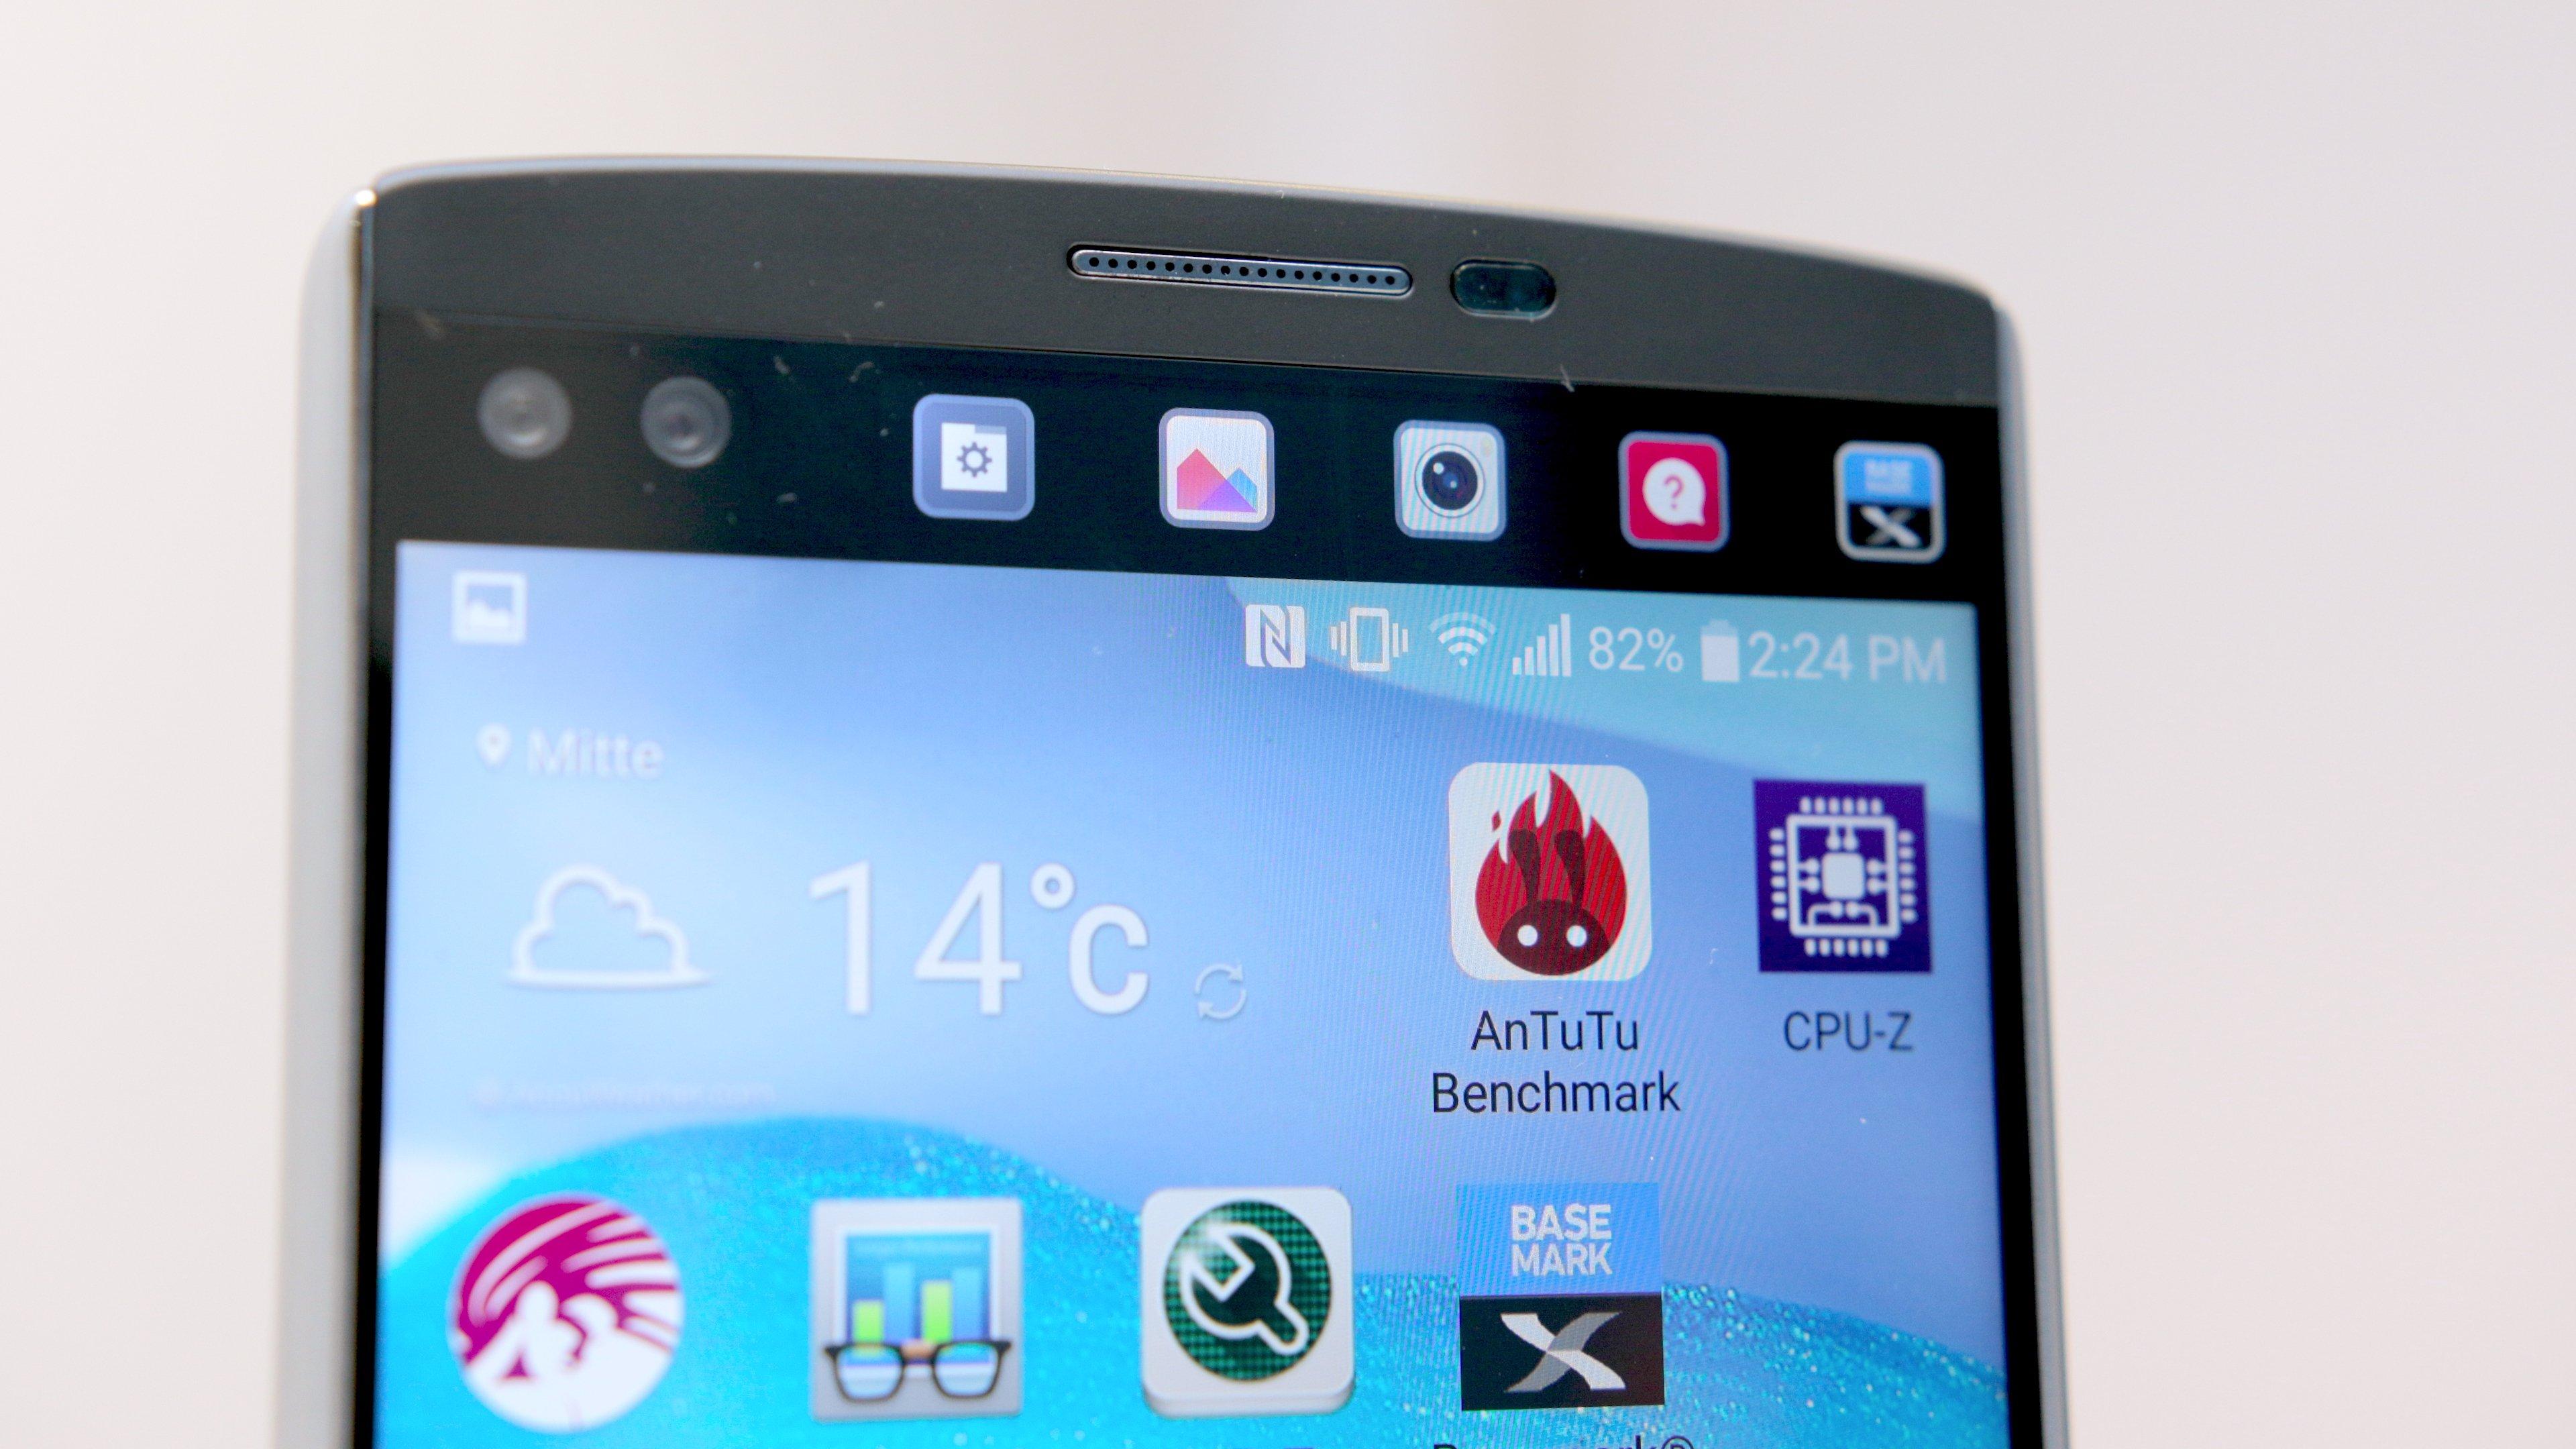 LG V10 Samsung Galaxy S6 Edge Marshmallow